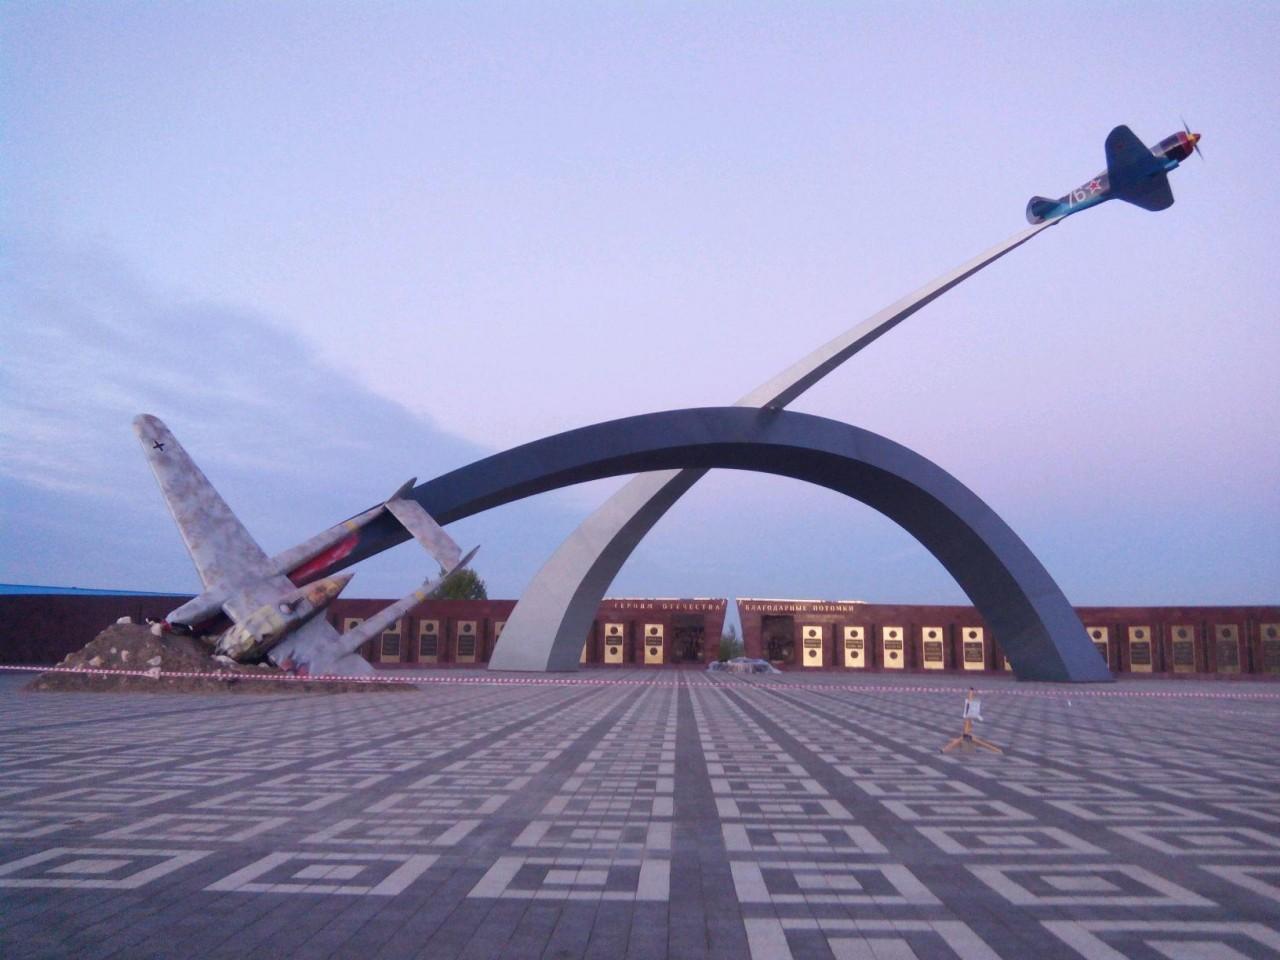 Памятник. Символично.